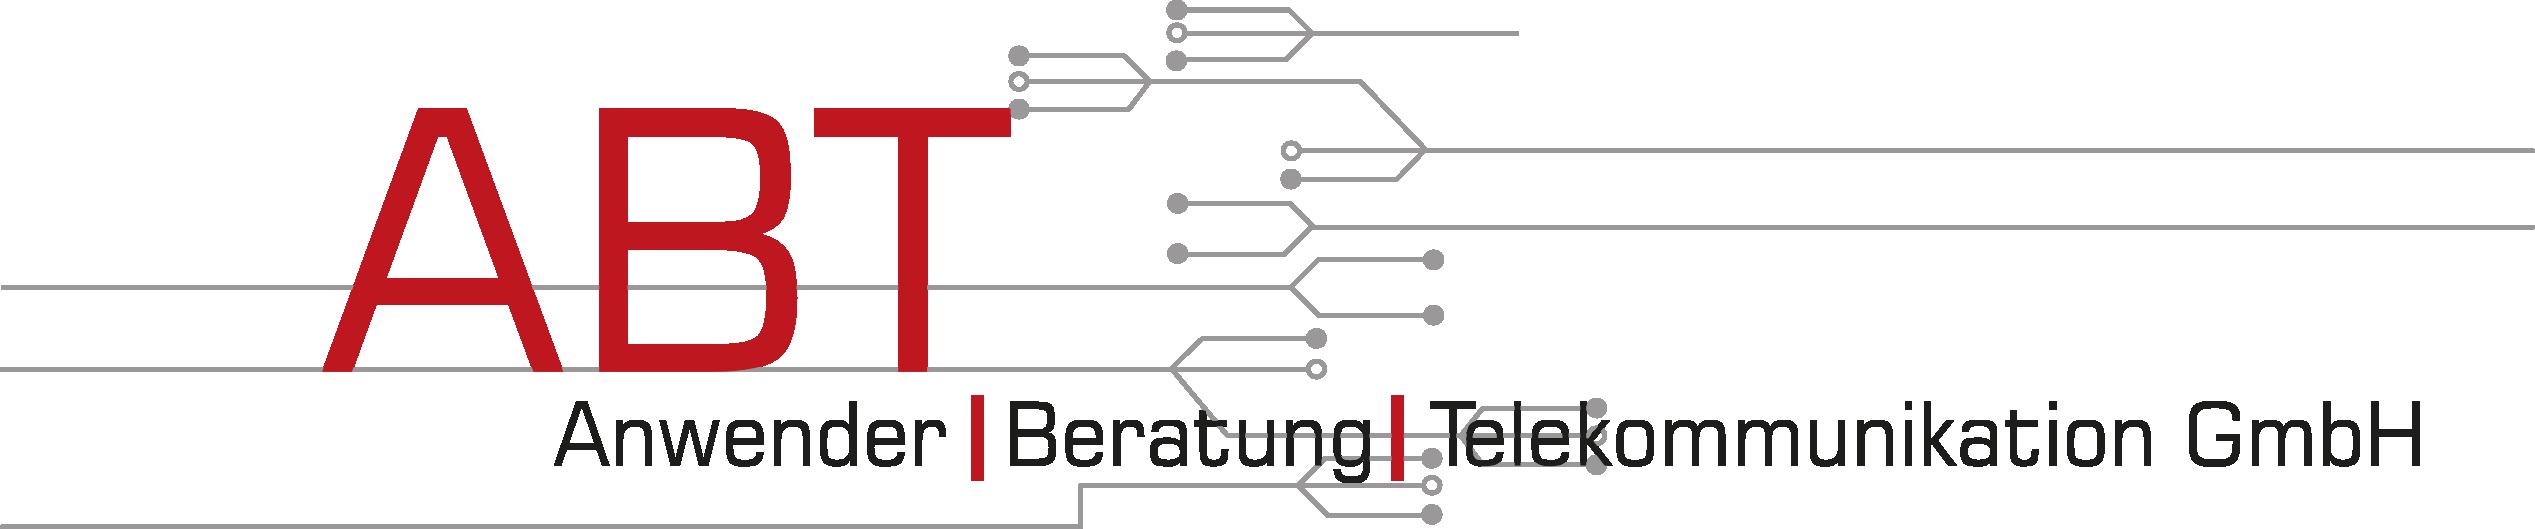 ABT Anwender Beratung Telekommunikation Logo